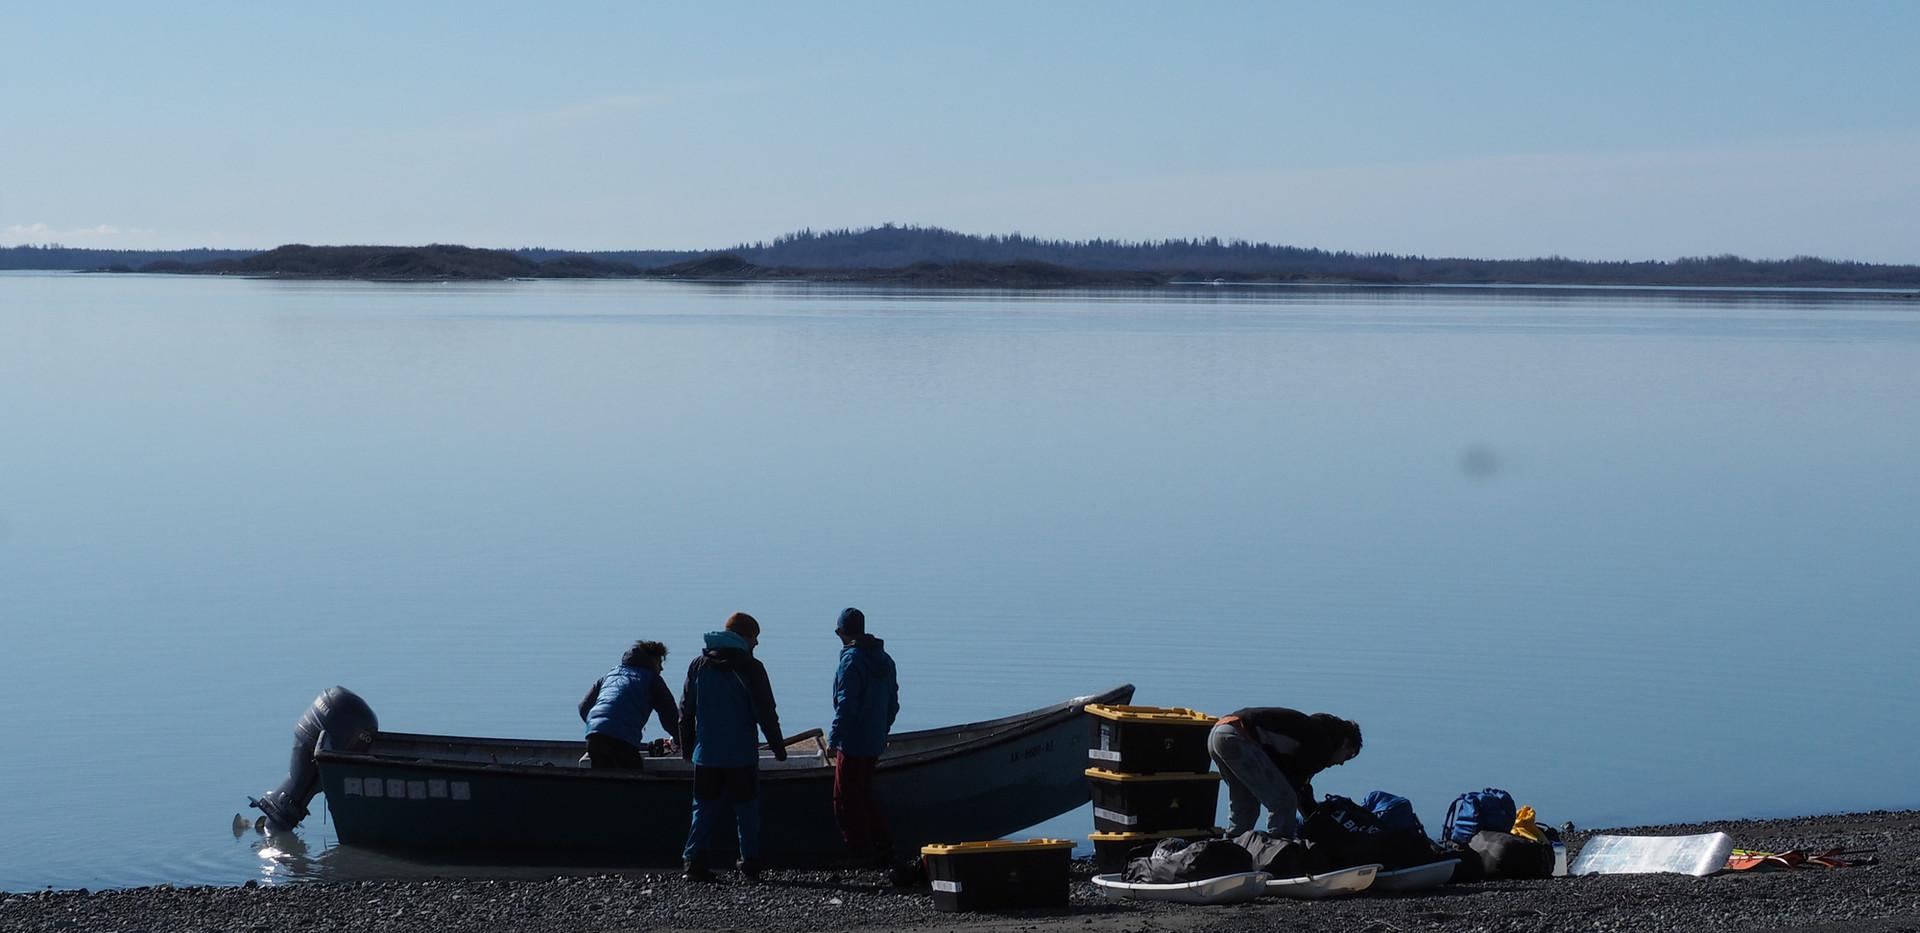 Unloading the boat, Malaspina Lake